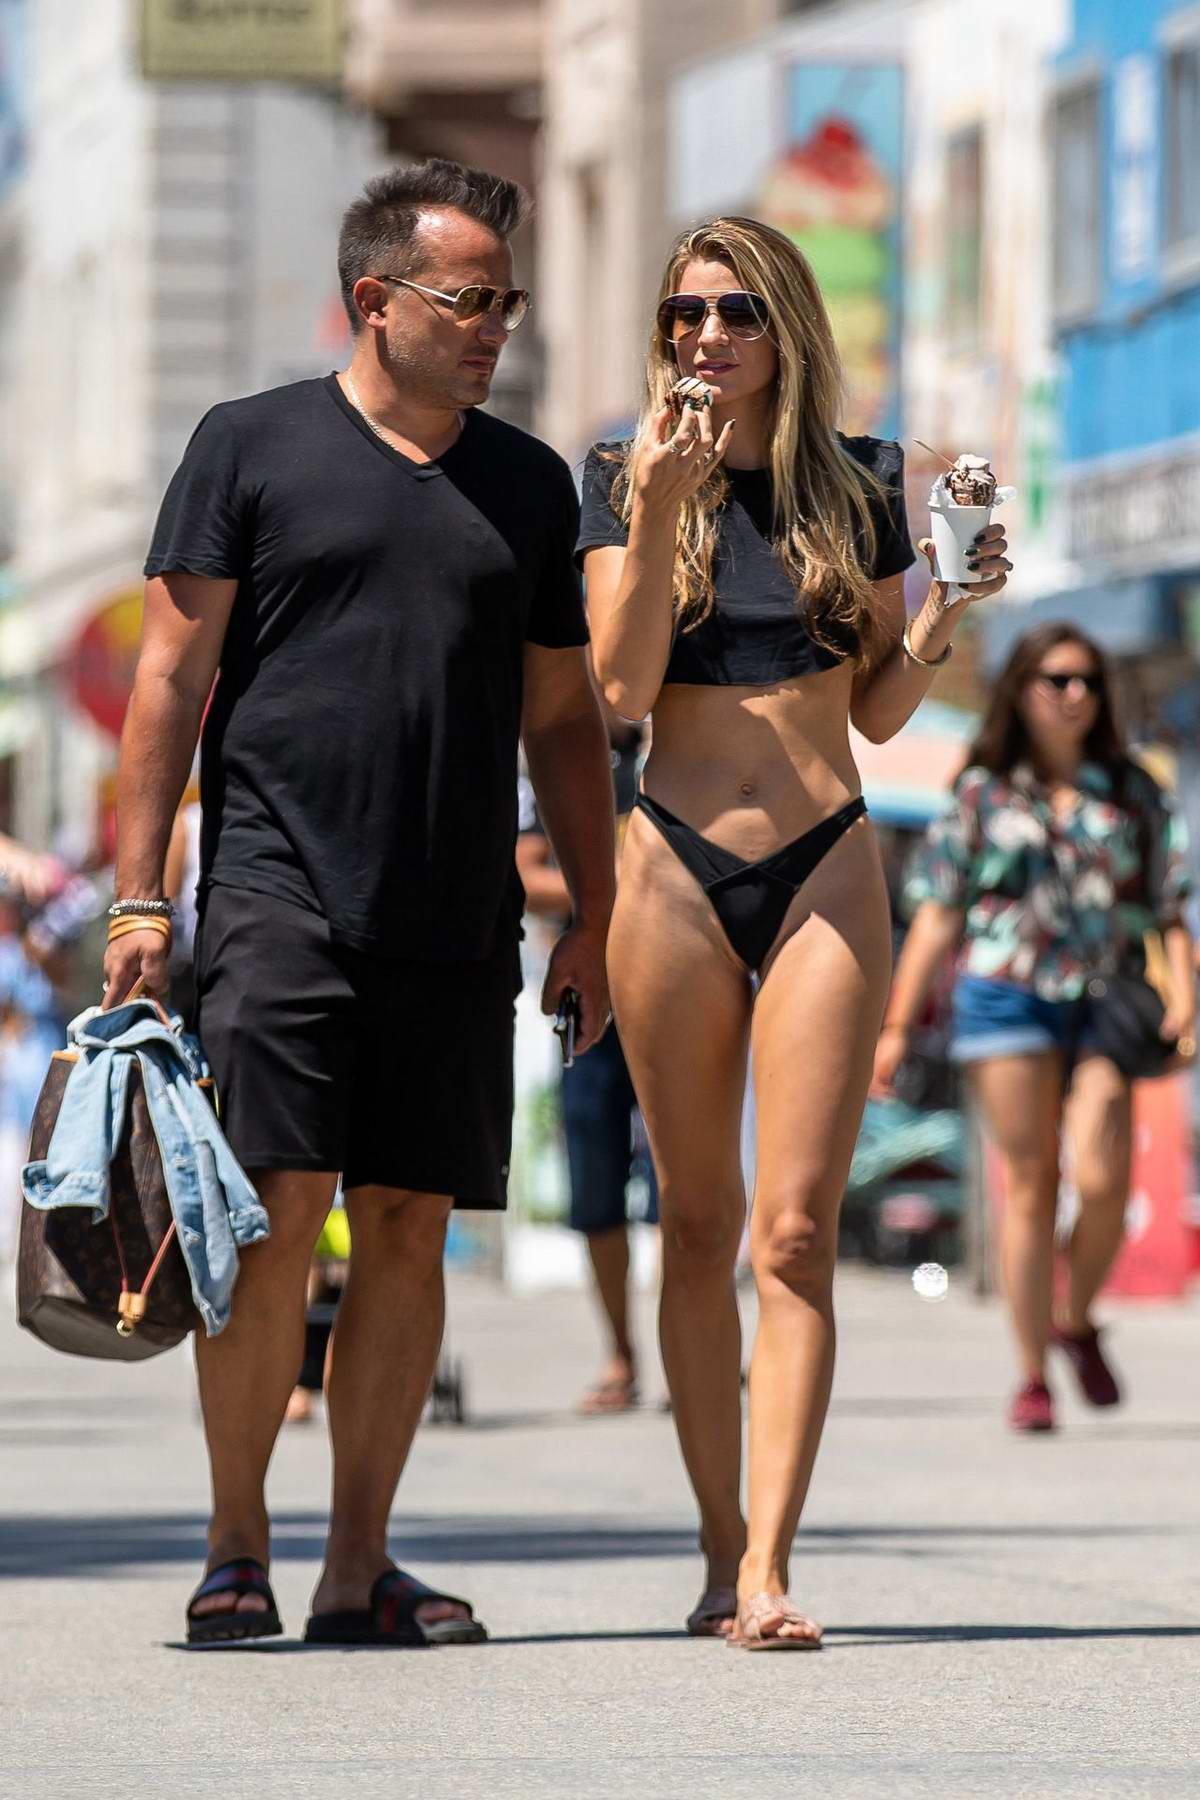 Rachel McCord wears a black crop top with bikini bottoms while enjoying a day out at Venice Beach, California